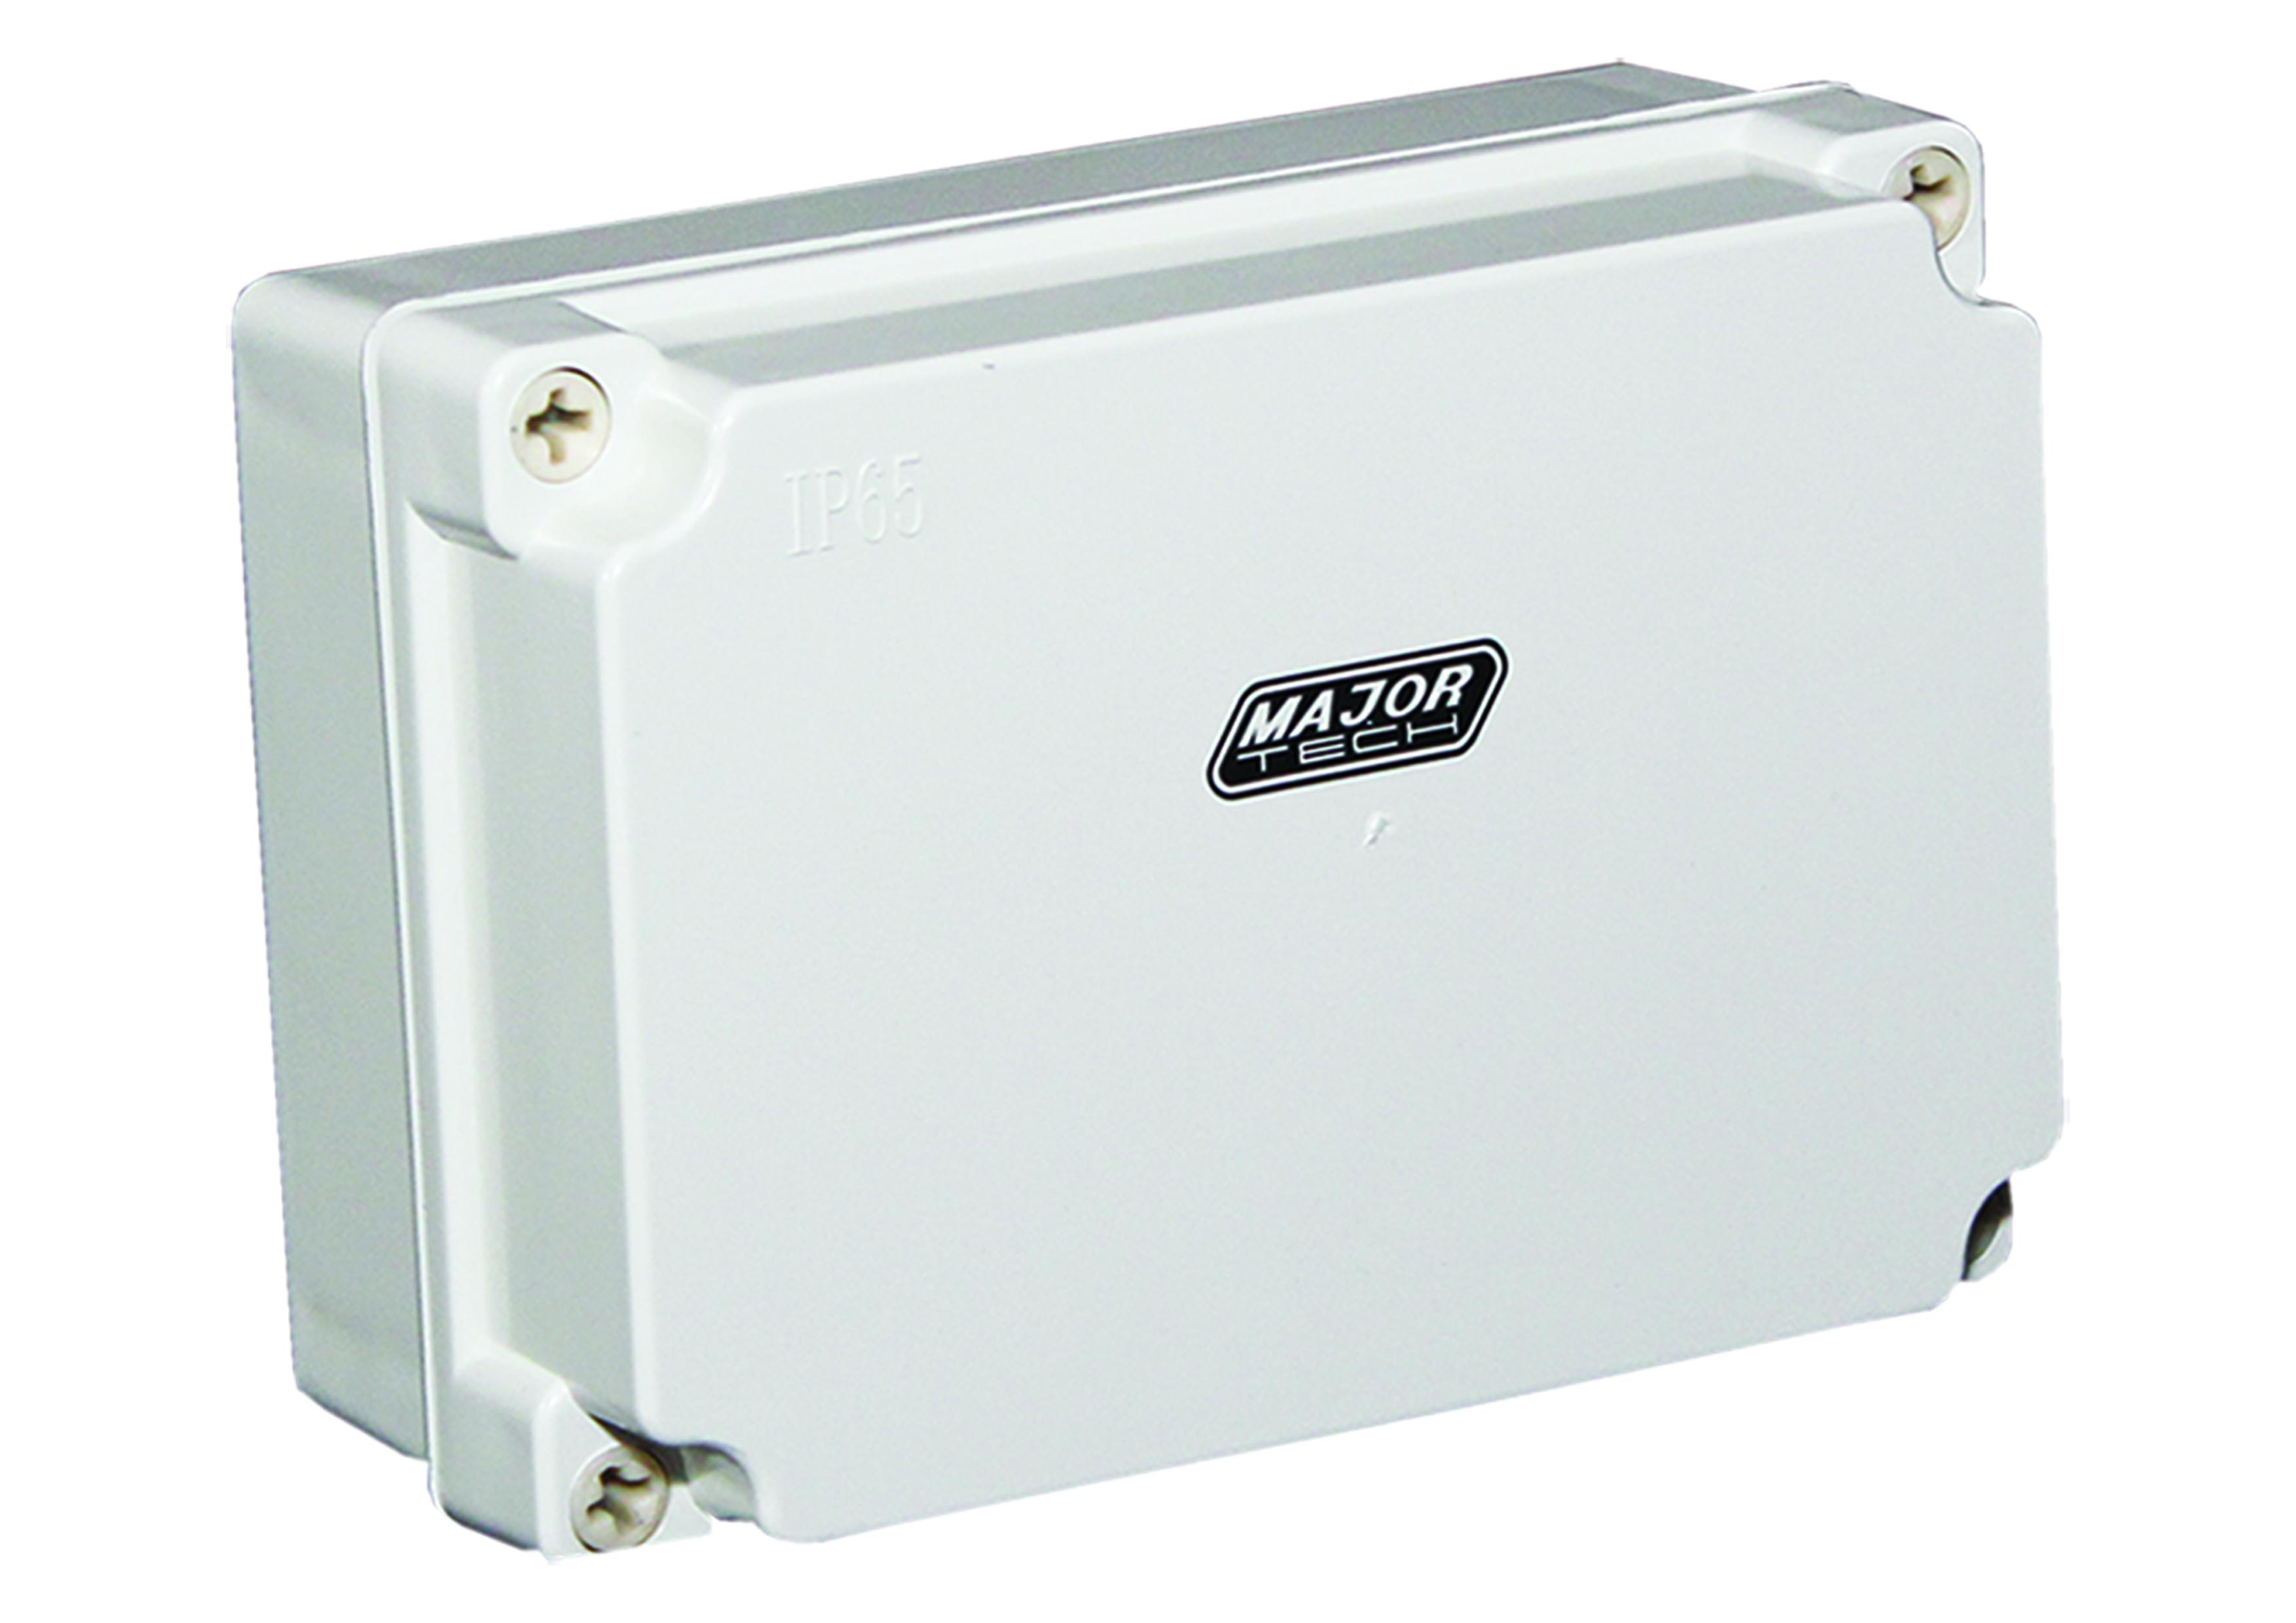 175mm x 125mm x 75mm IP65 Junction Box Pack of 2 (VW17127) - VETi